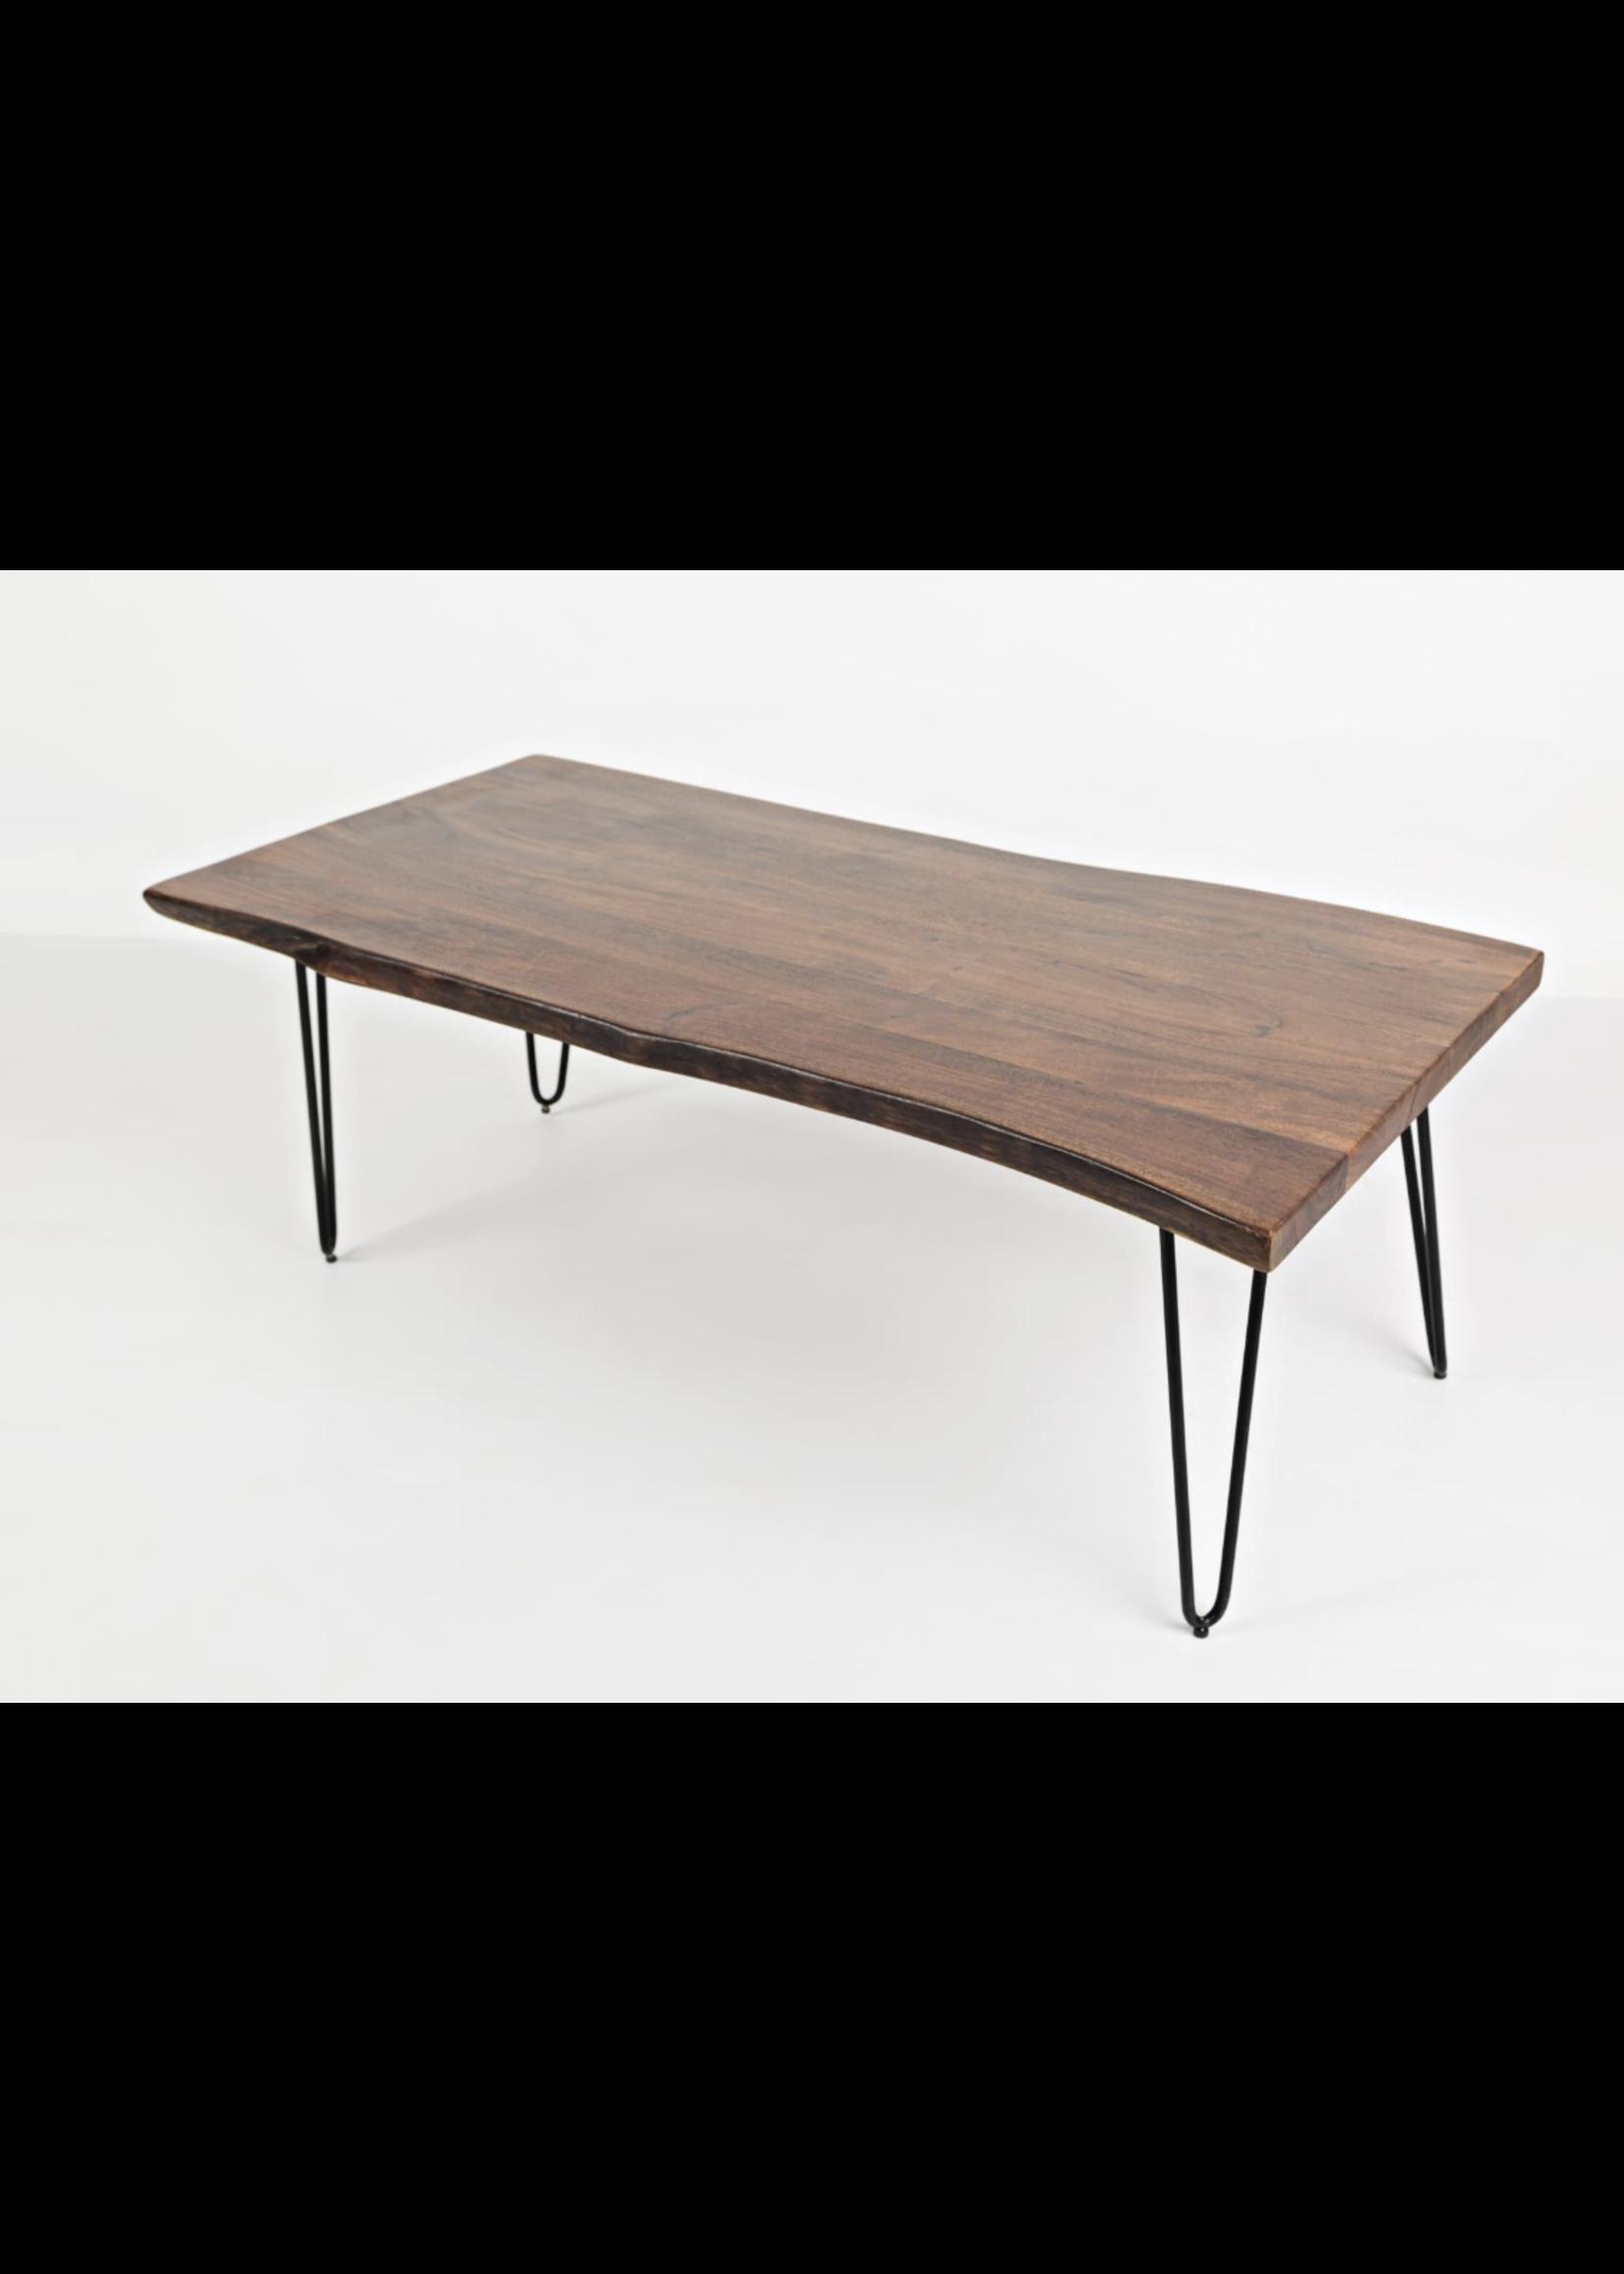 New Chestnut Coffee Table 1780-1 JO